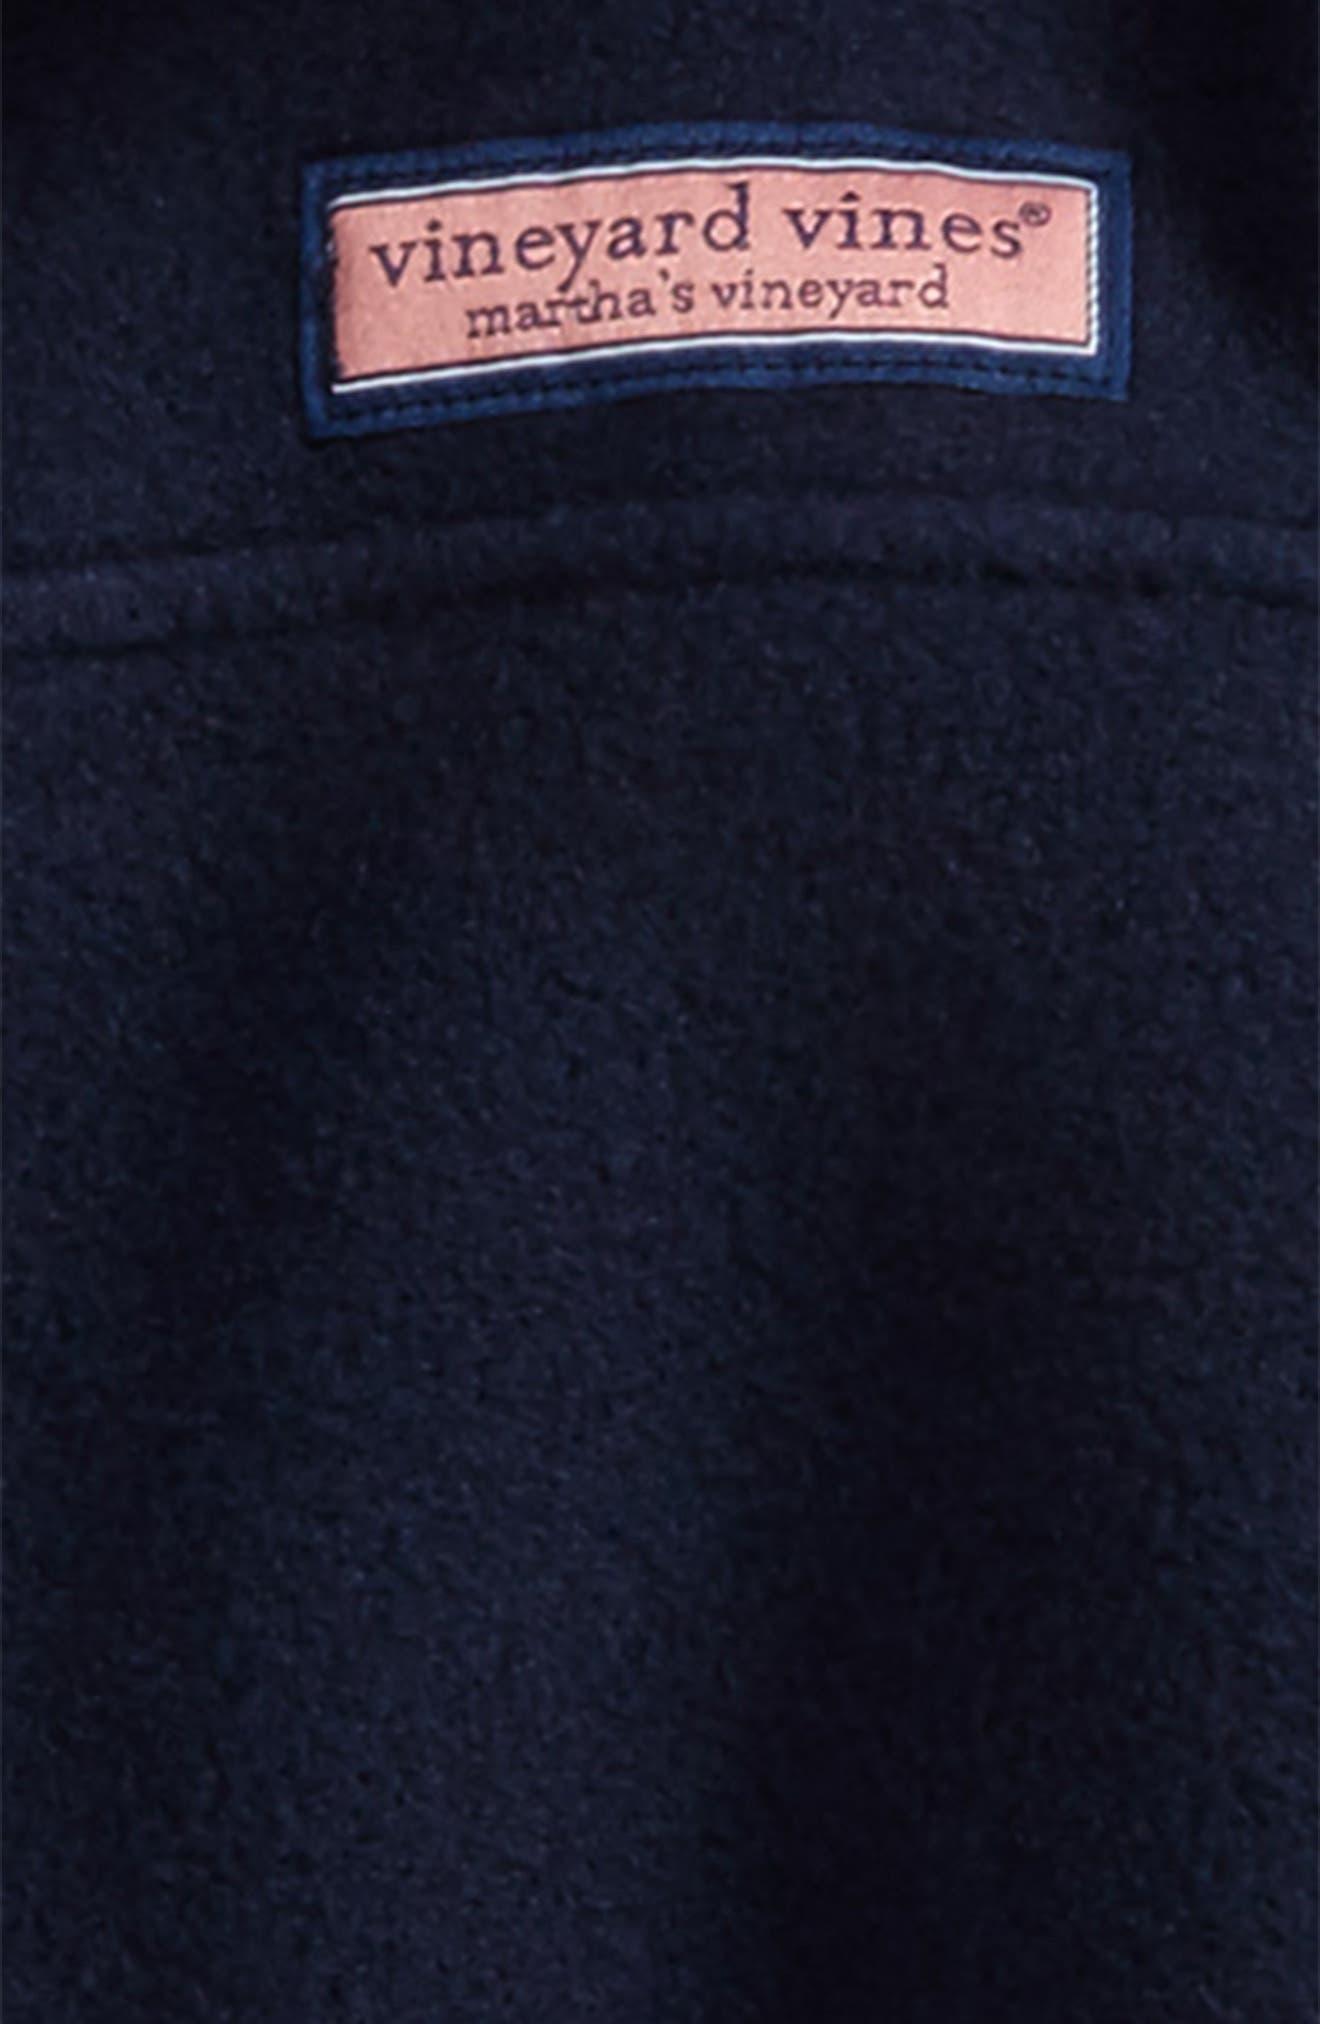 Hooded Full Zip Fleece Jacket,                             Alternate thumbnail 2, color,                             Vineyard Navy